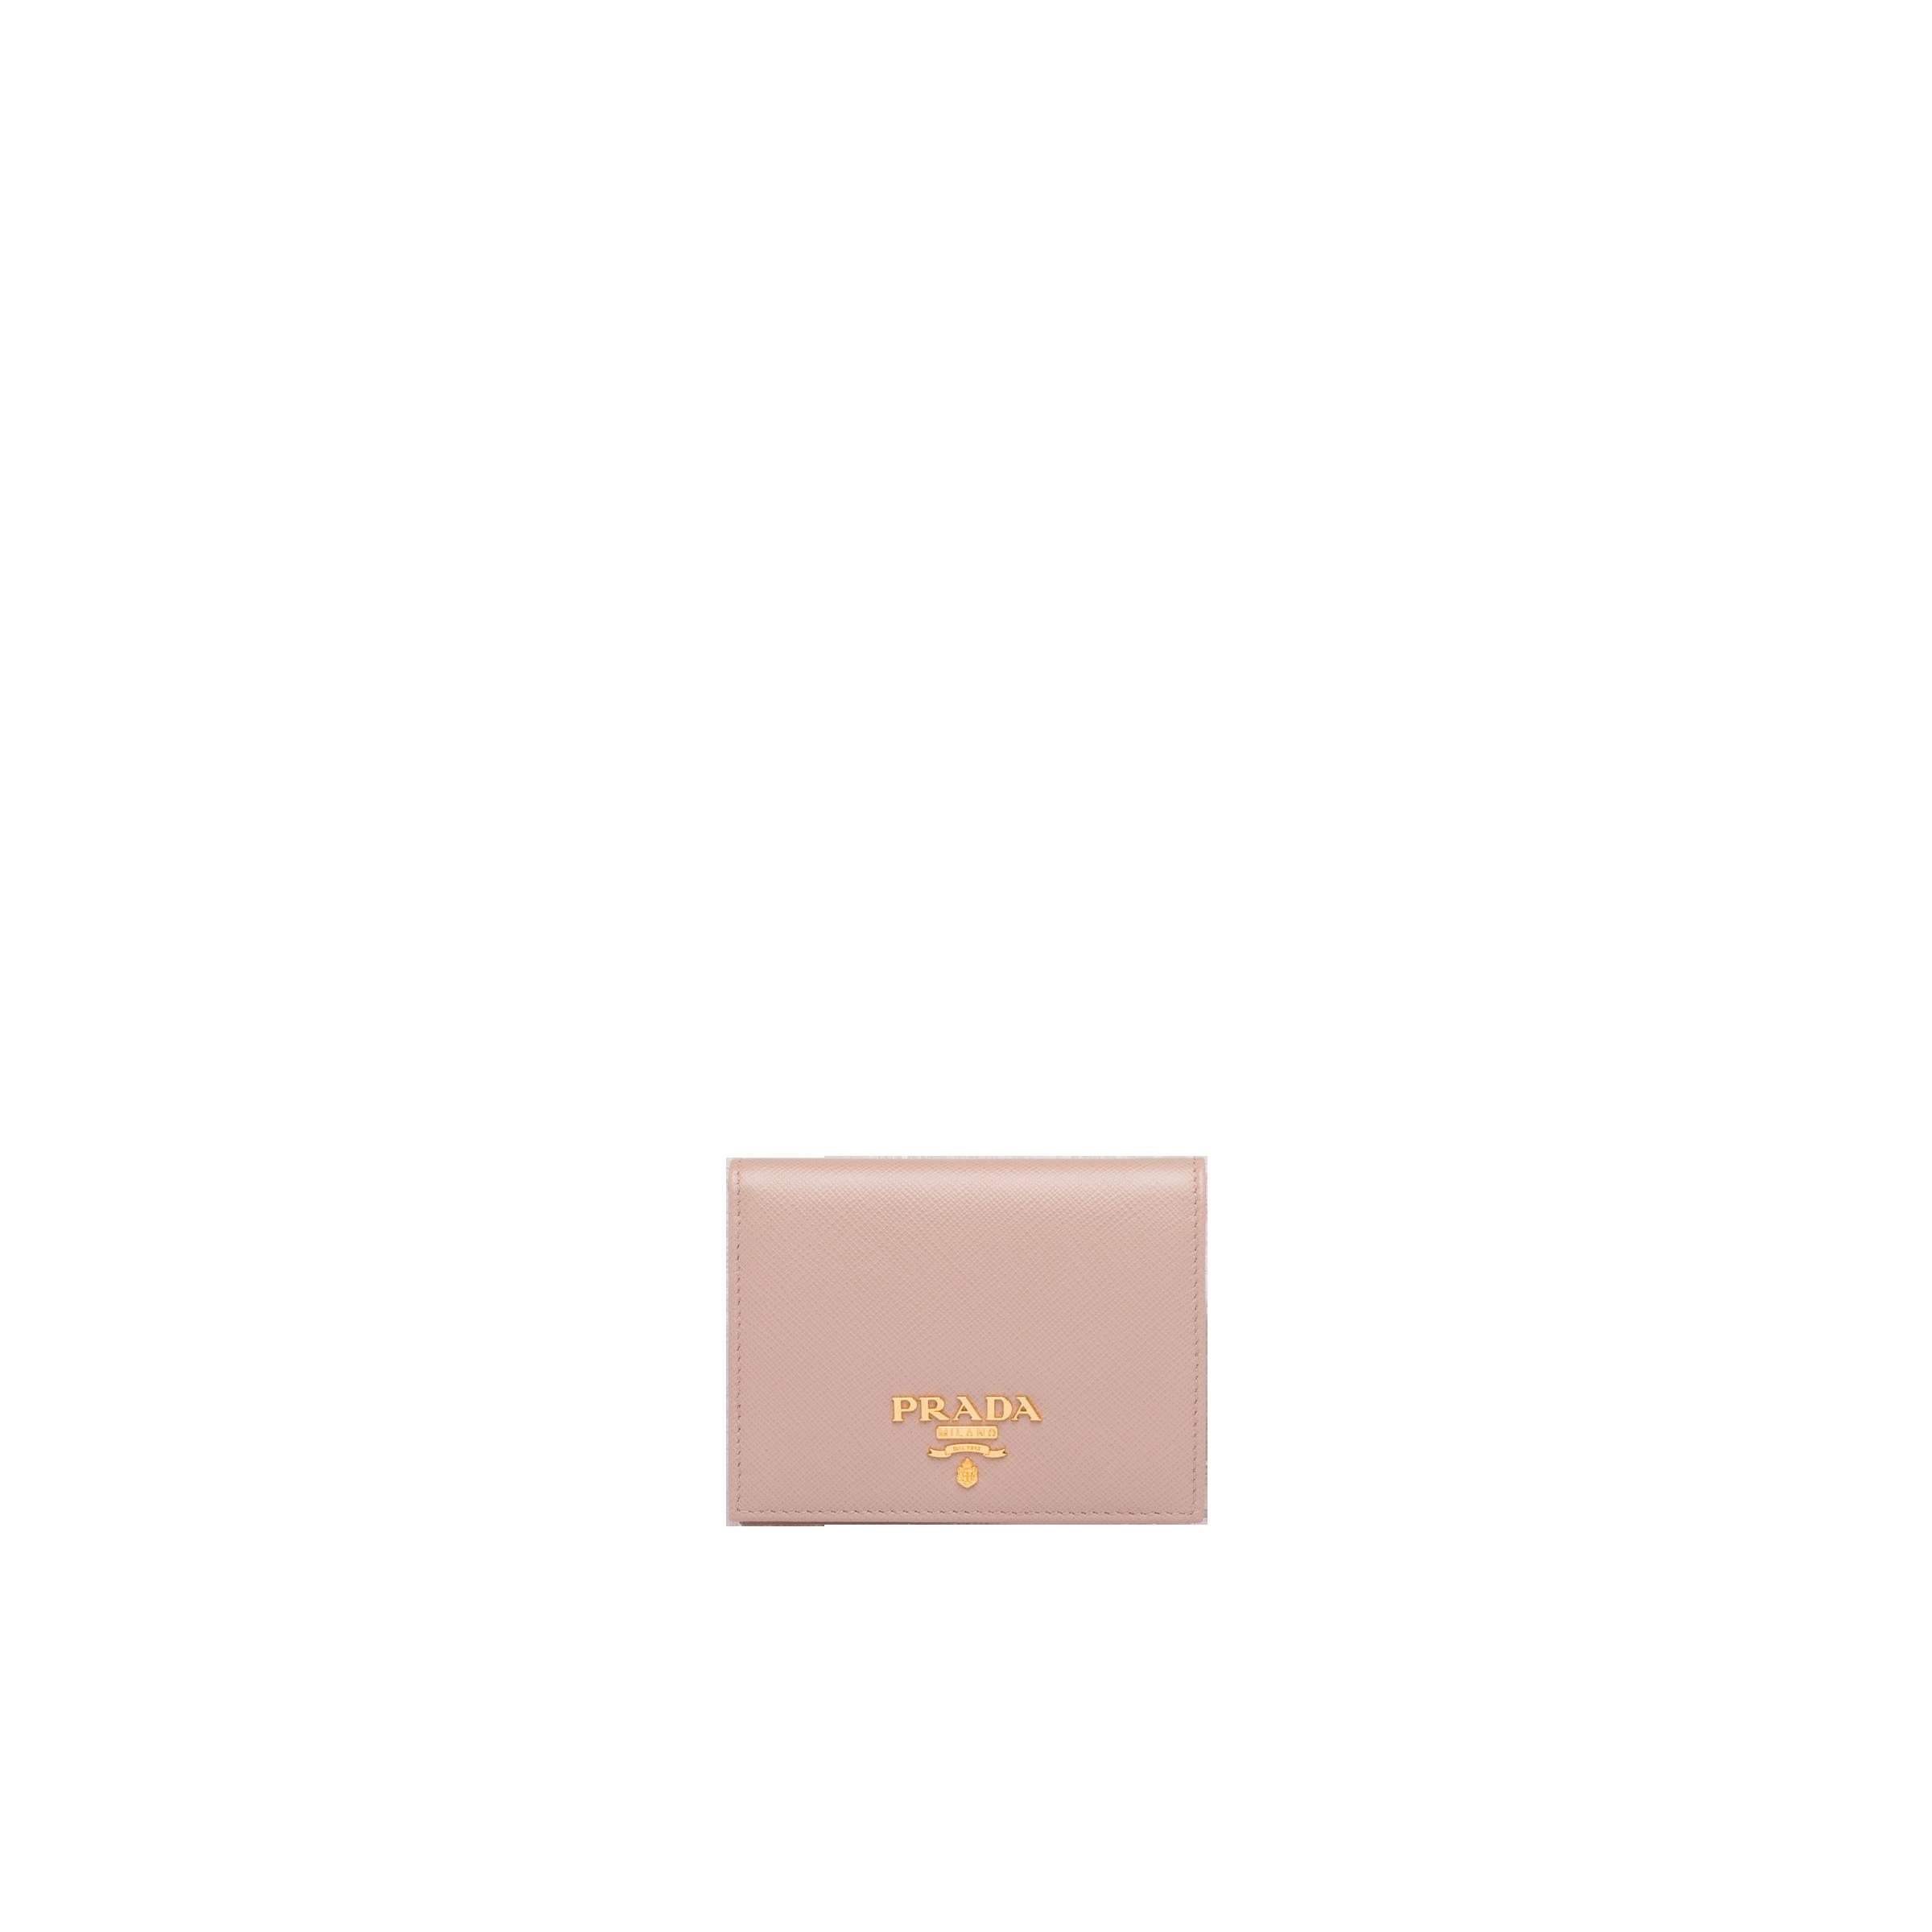 4e03198f6d65 Women's Wallets | Prada